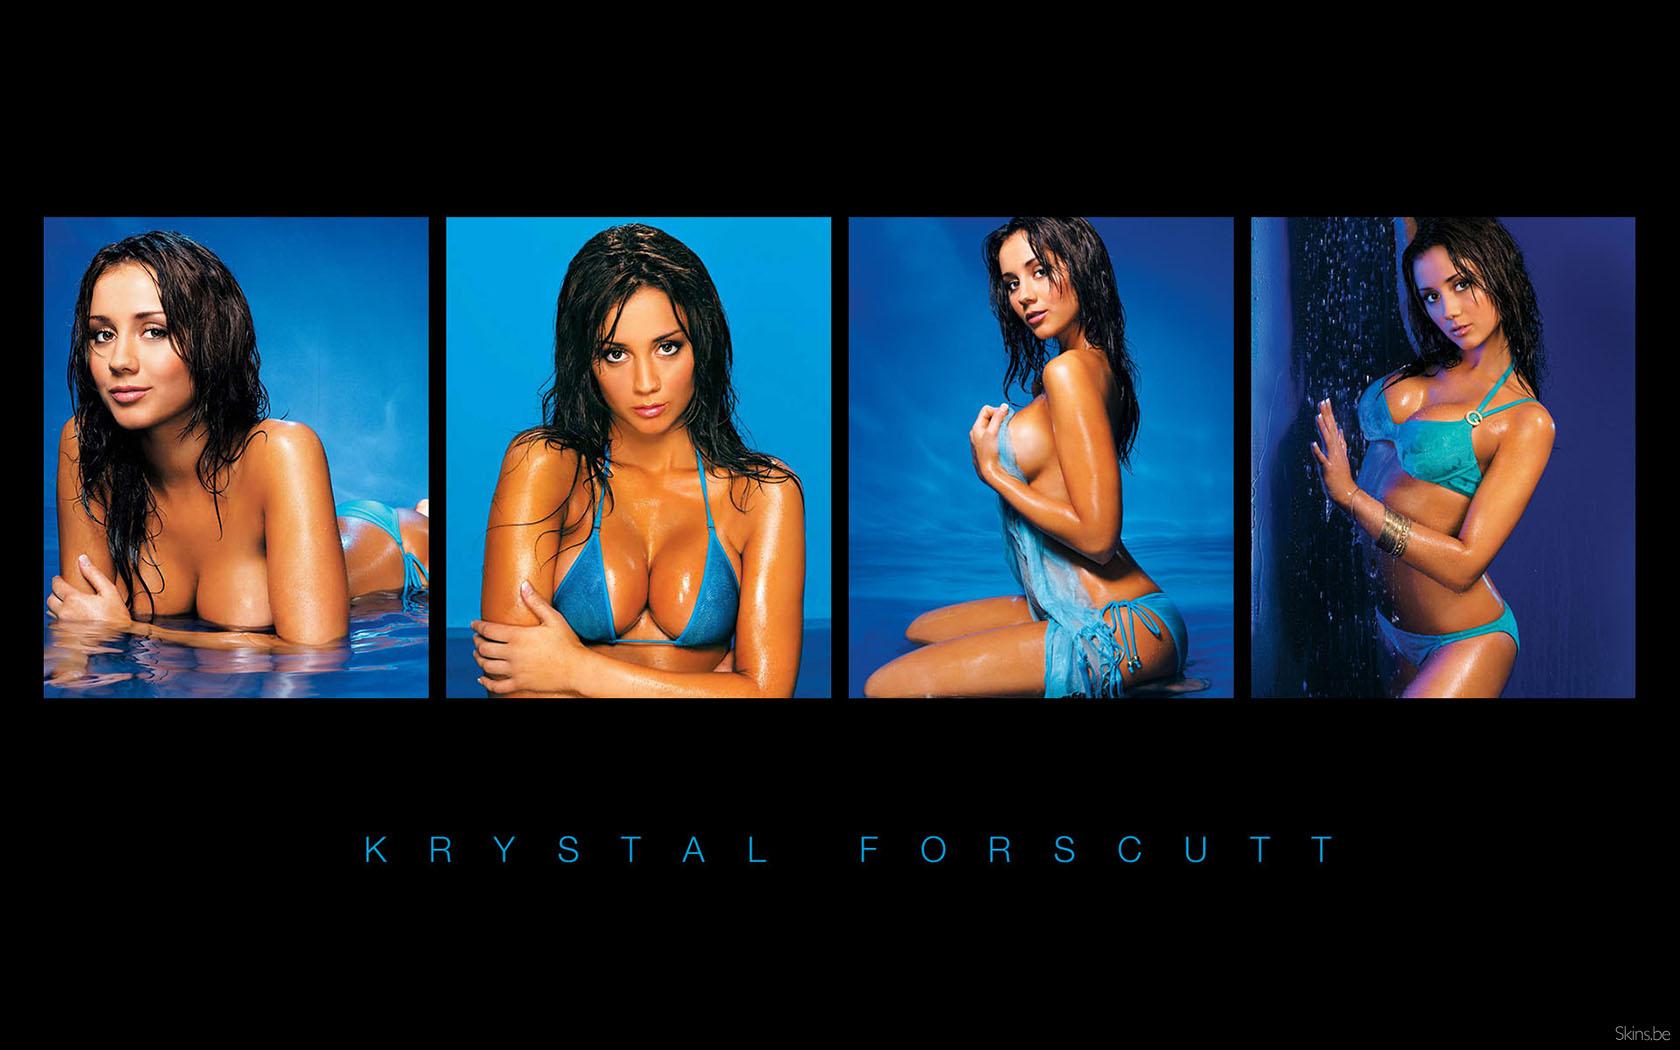 Krystal Forscutt wallpaper (#32383)